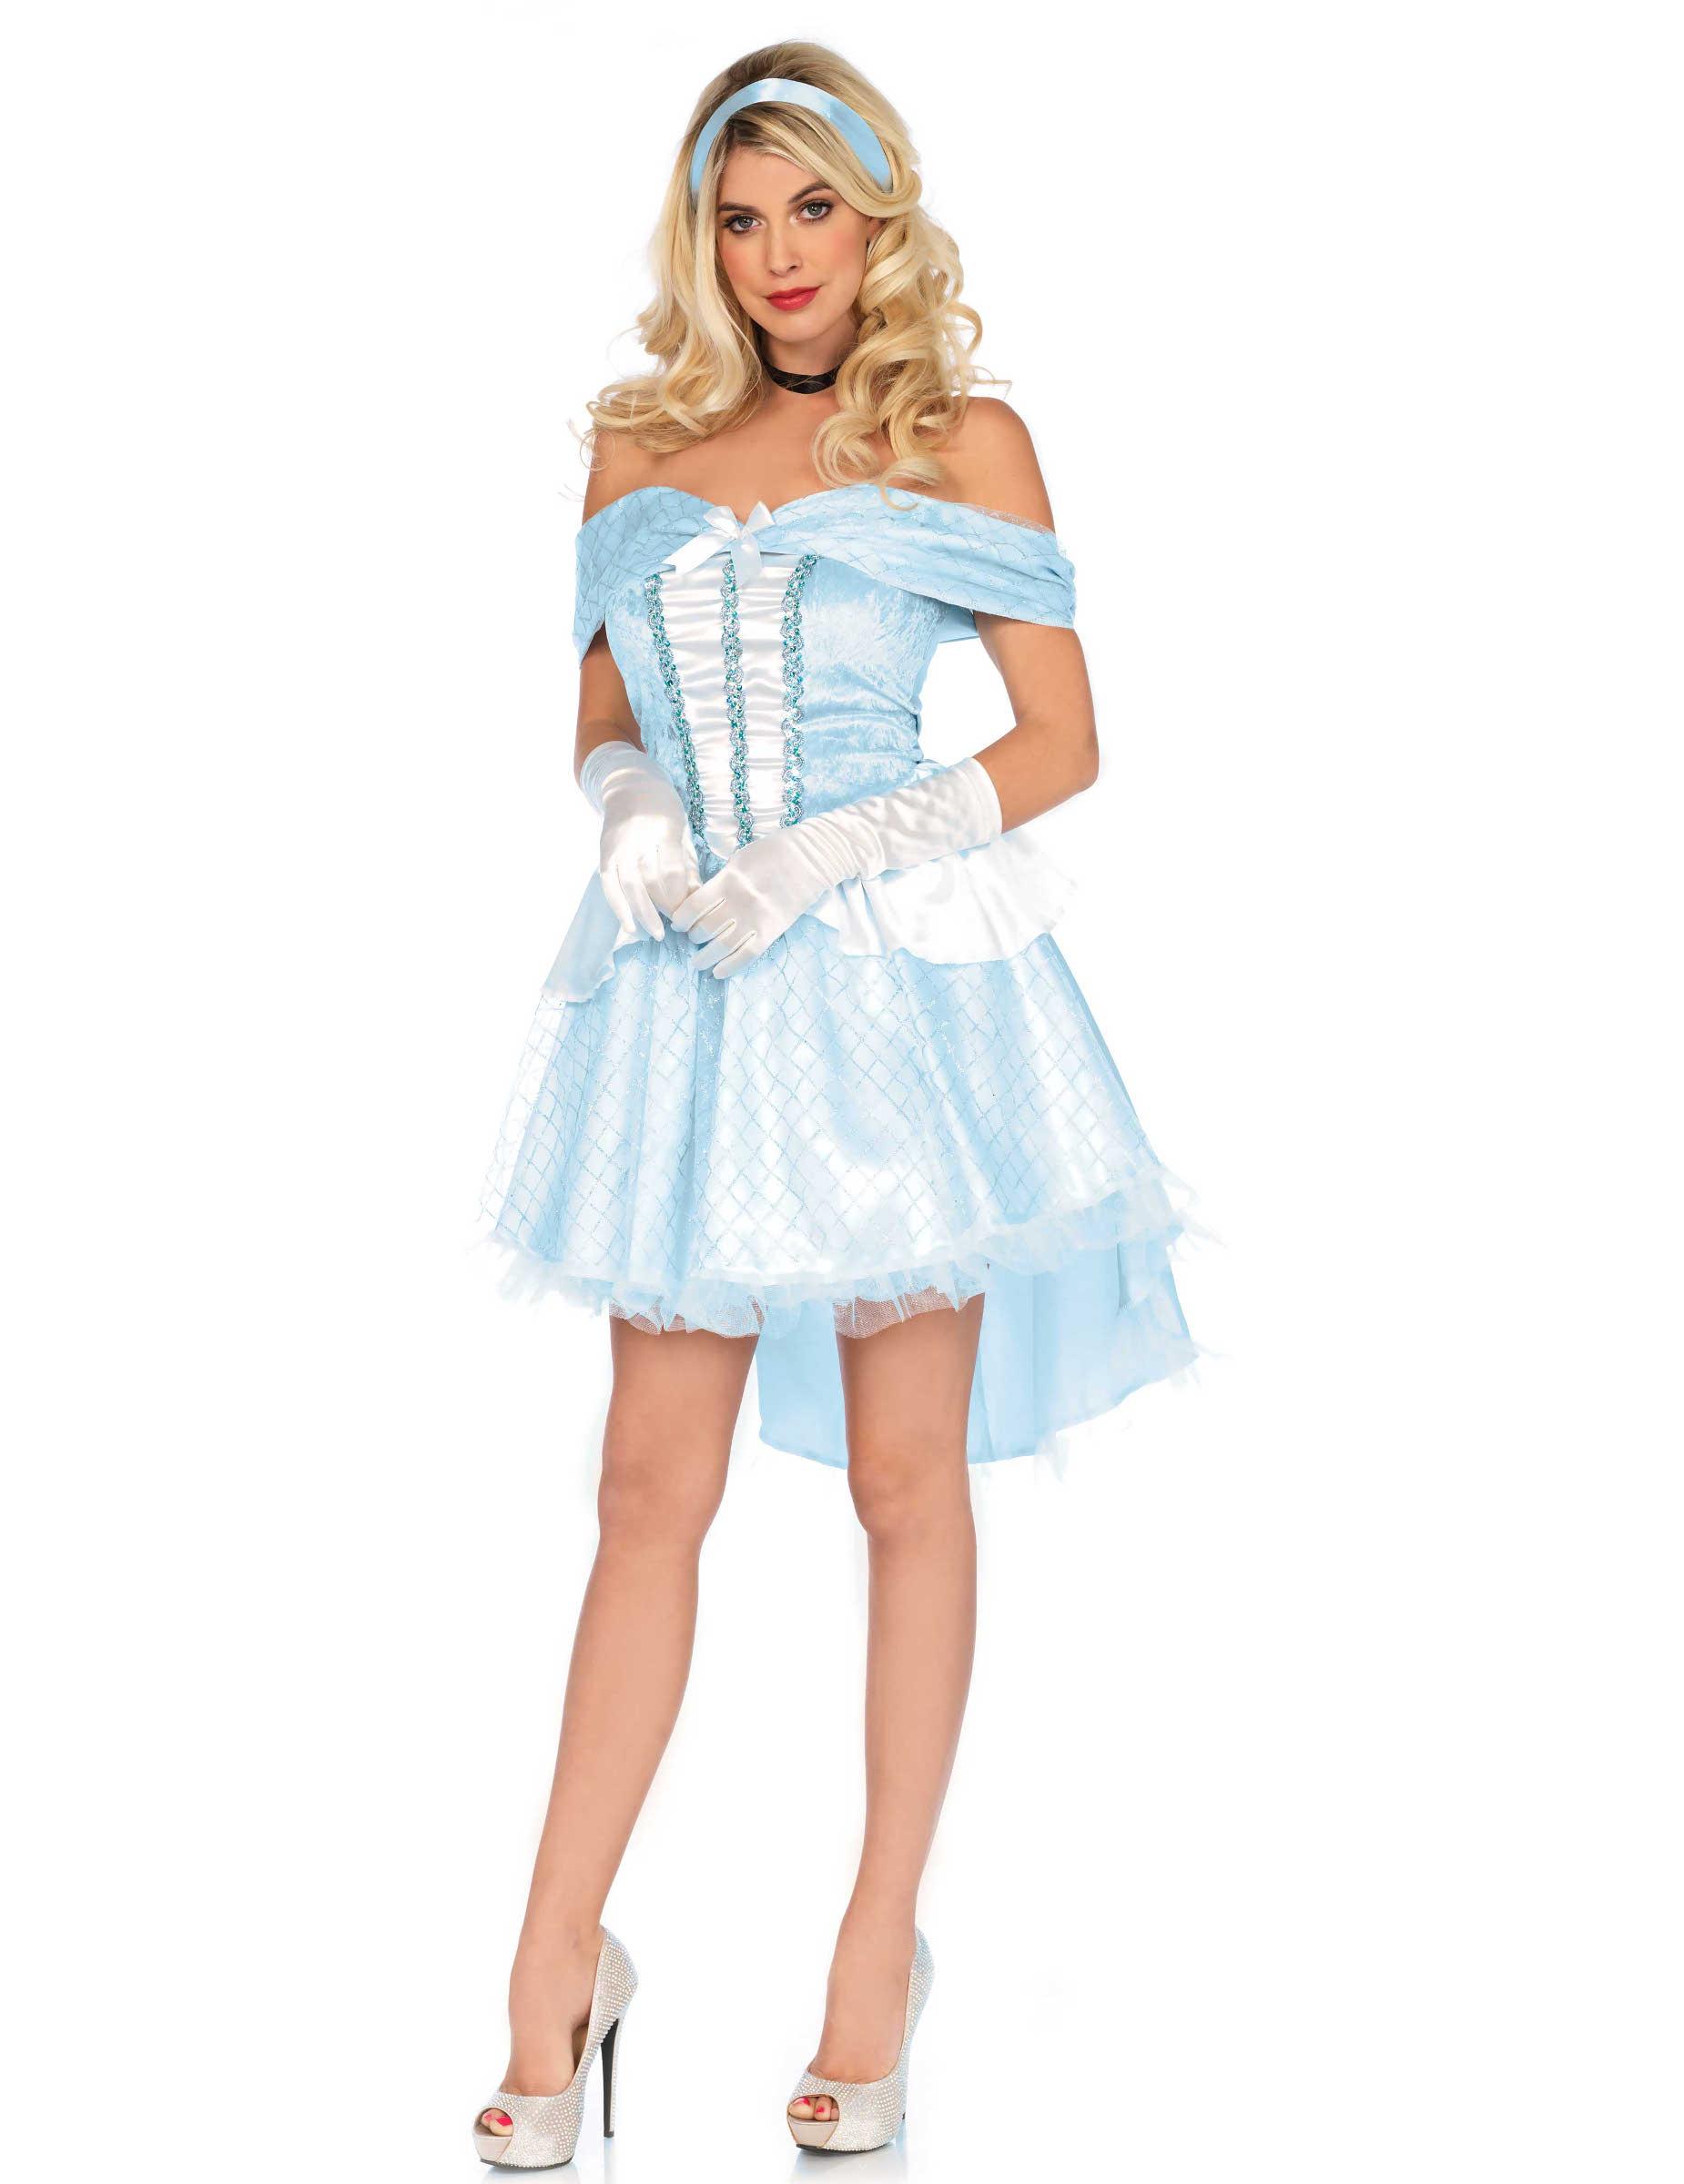 Kostum Glas Prinzessin Fur Damen Gunstige Faschings Kostume Bei